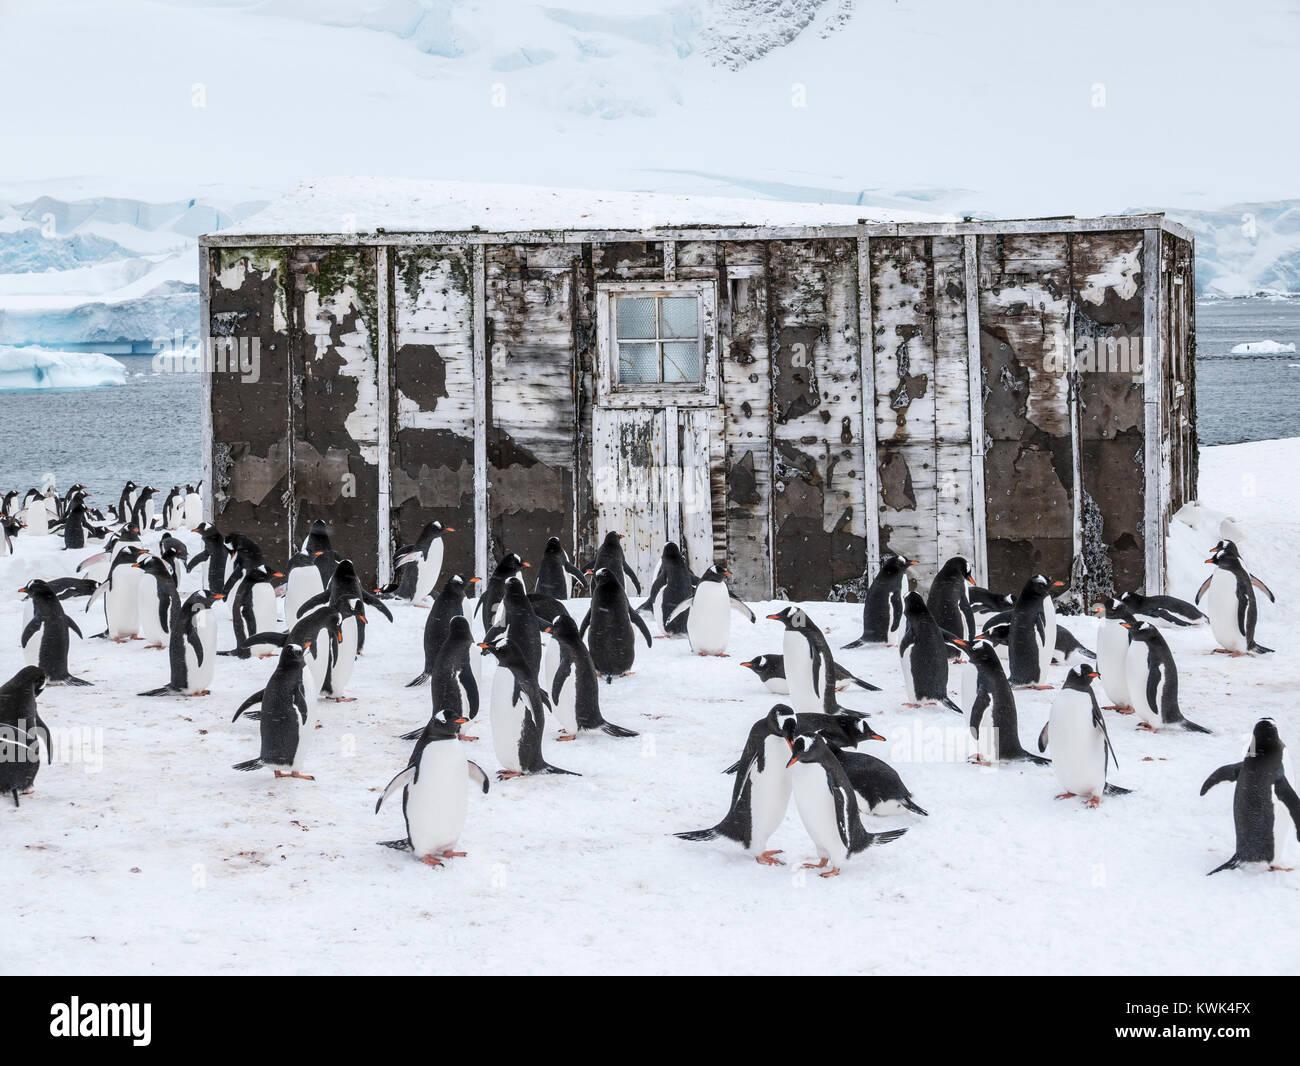 Long-tailed Gentoo penguin; Pygoscelis papua; Chilean Research Center; Antarctica - Stock Image